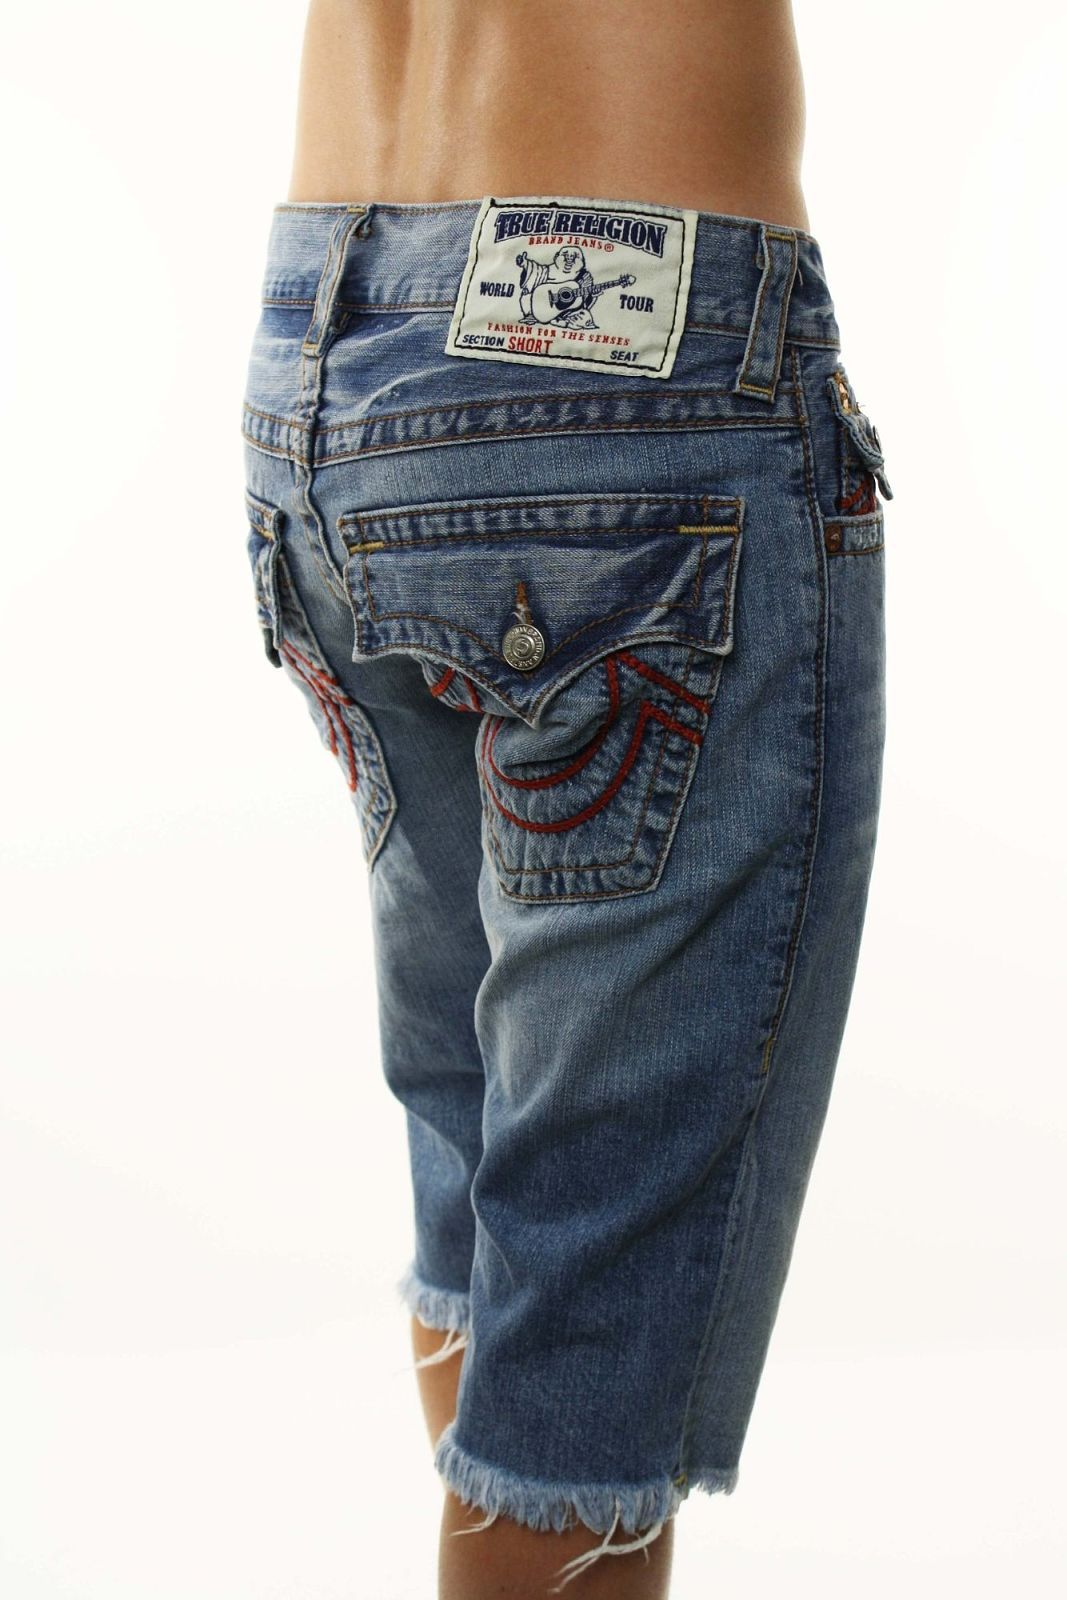 True Religion store | True Religion Brand Jeans Men's